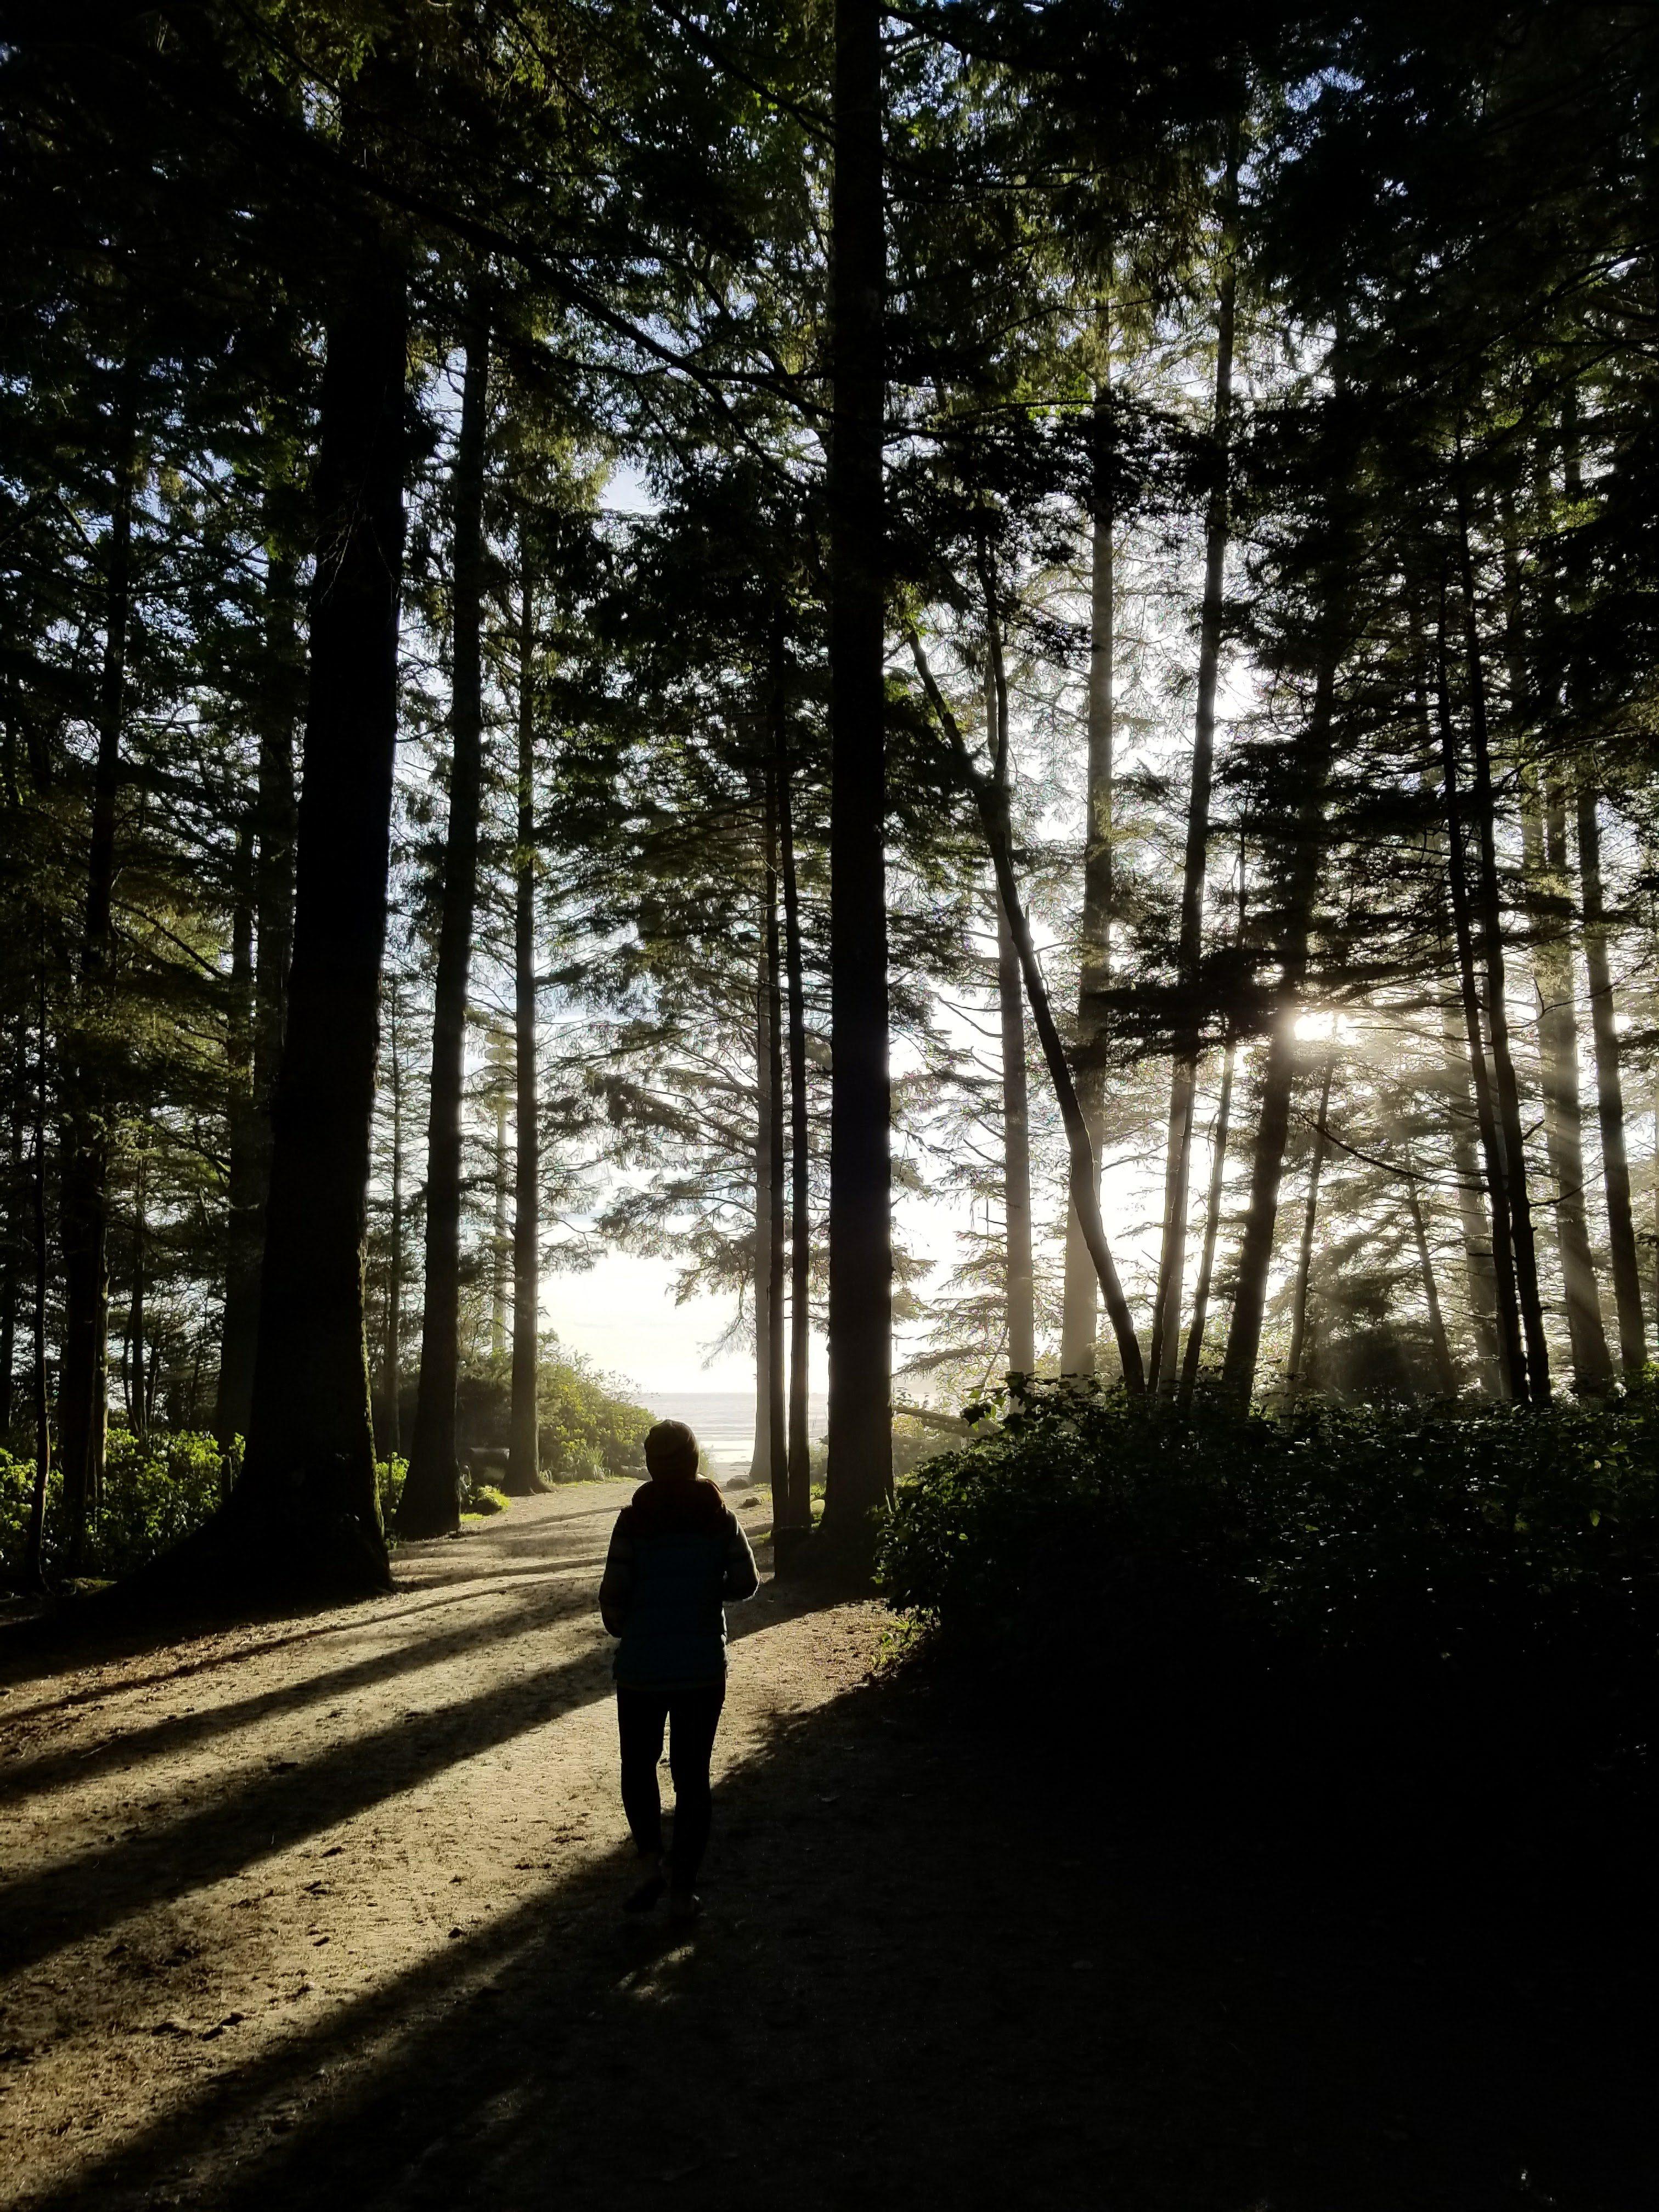 forest, beach, woman, trees, shadows